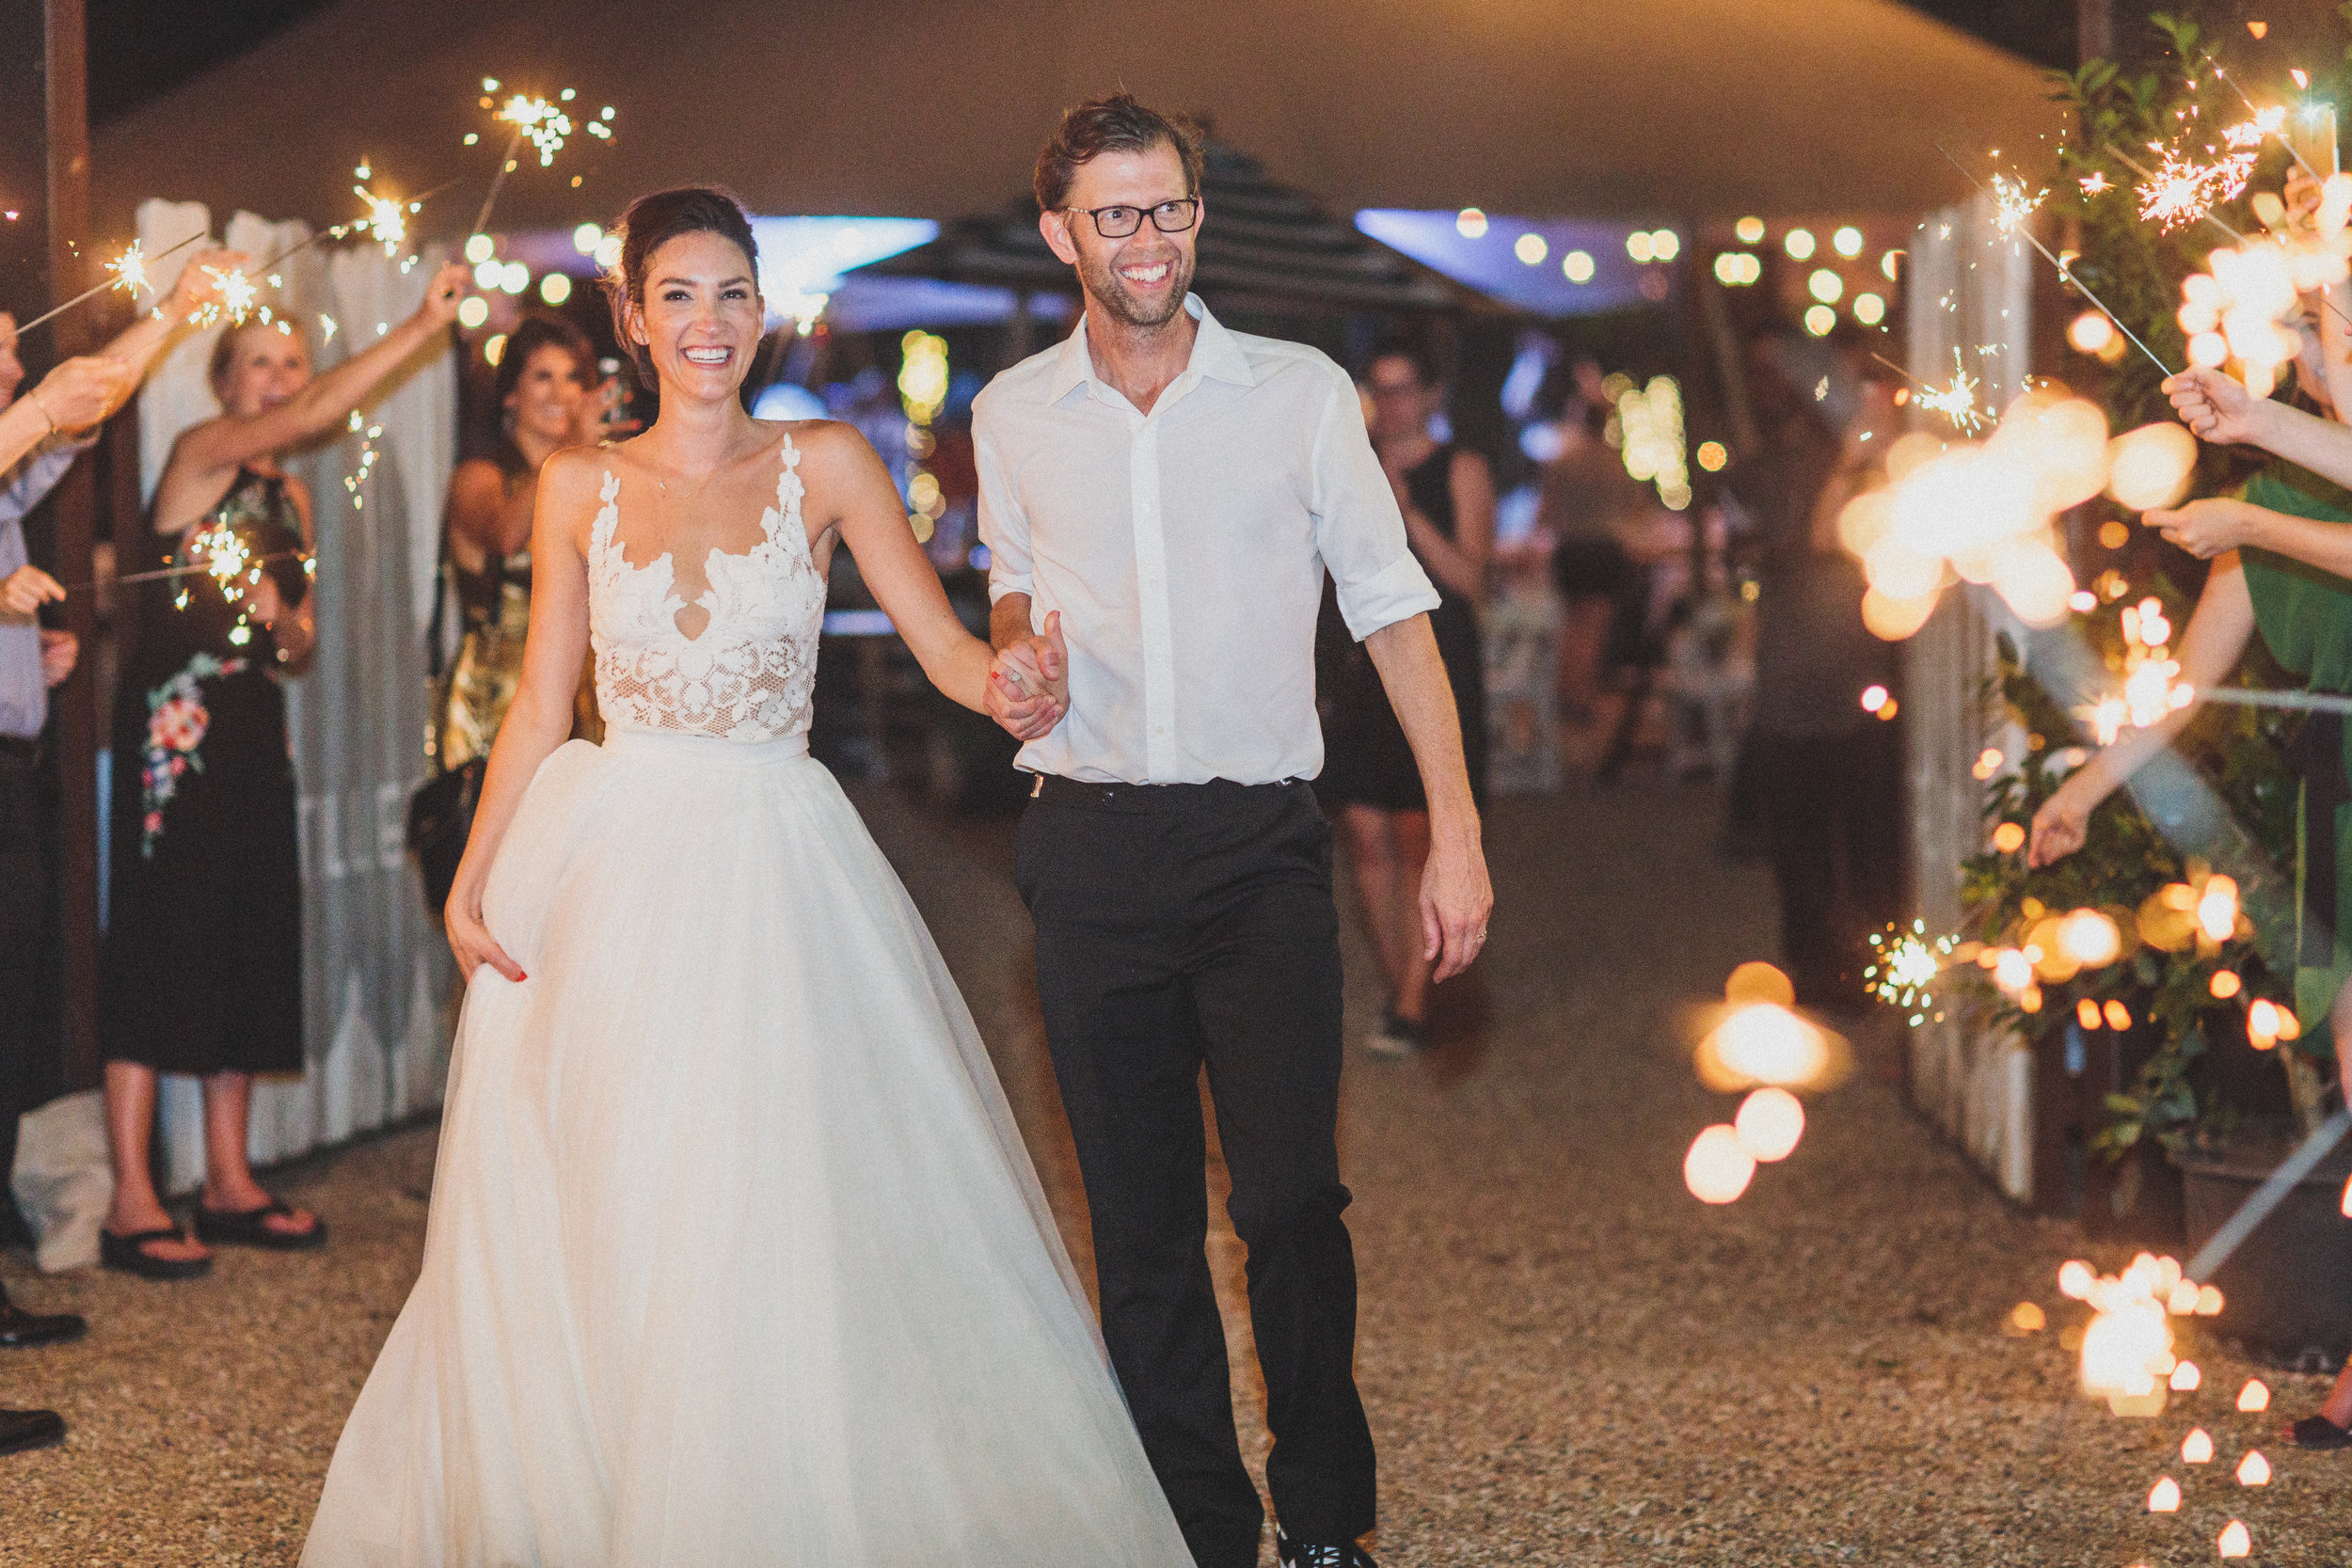 A Vibrant, Tropical Austin Wedding - The Overwhelmed Bride Wedding Blog  Ideas Inspiration